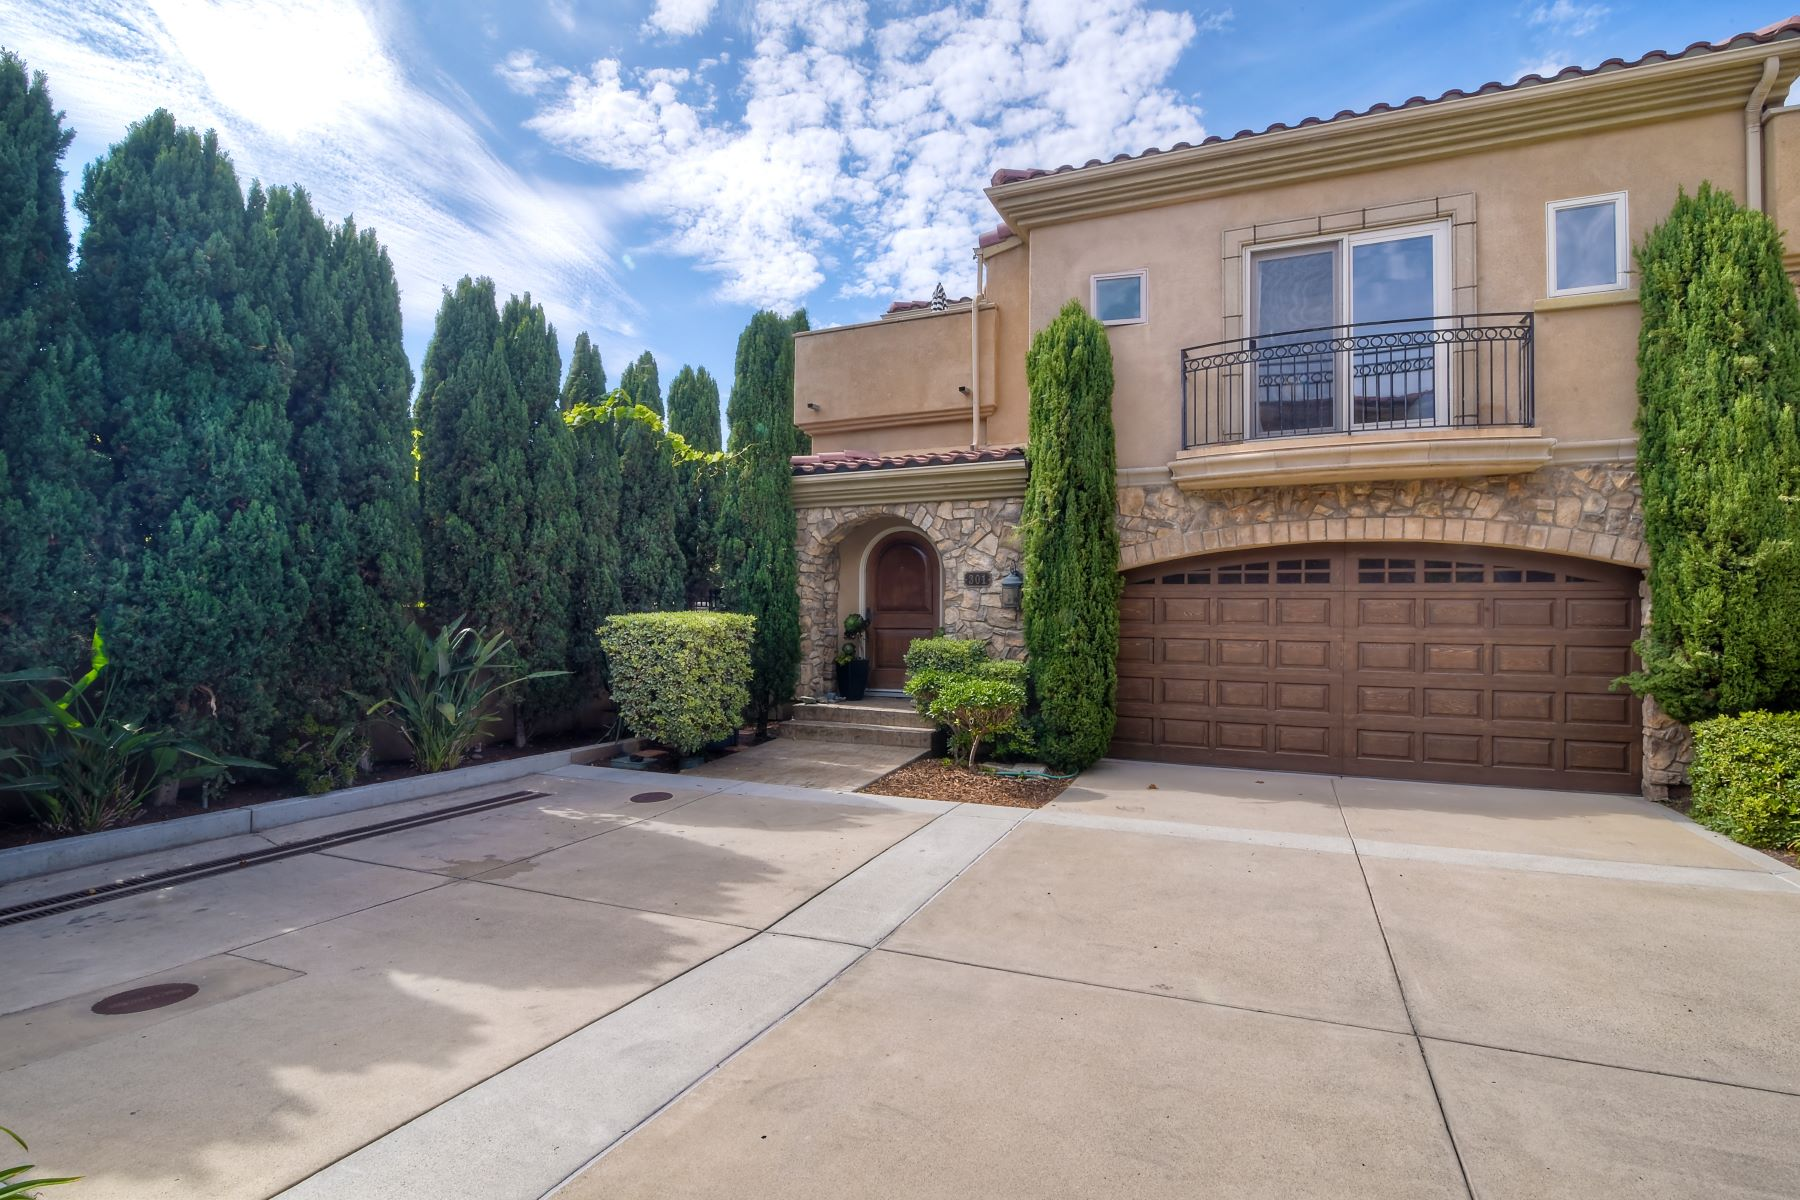 Single Family Homes for Sale at 301 N Rios Avenue Solana Beach, California 92075 United States